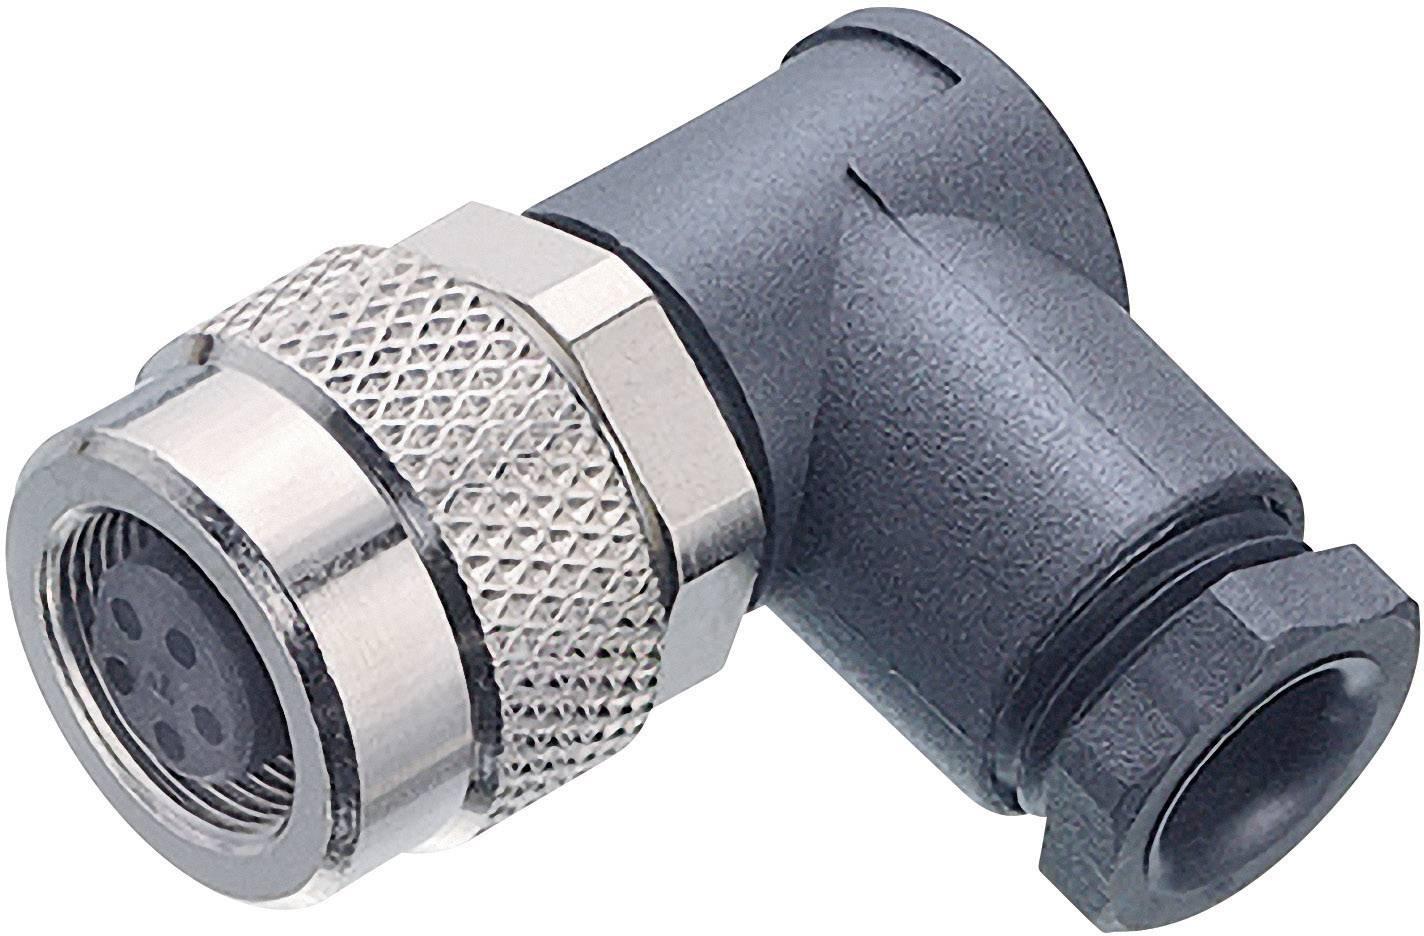 Guľatý konektor submin. Binder 99-0422-70-07, 7-pol., uhlová zásuvka, 3,5 - 5 mm, IP67